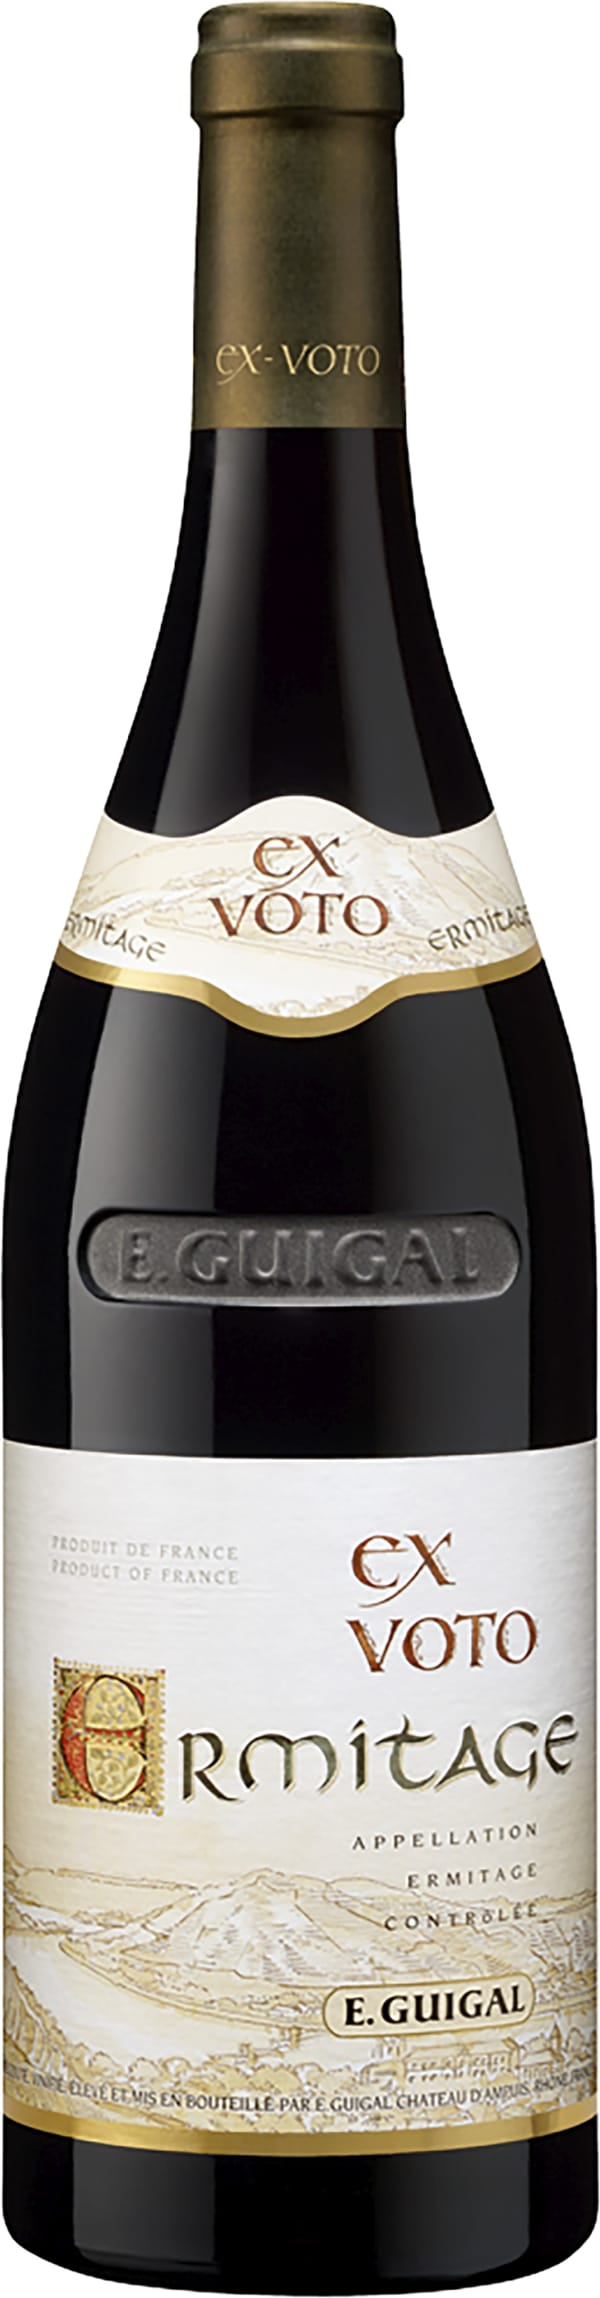 Guigal Ex Voto Ermitage Rouge 2017